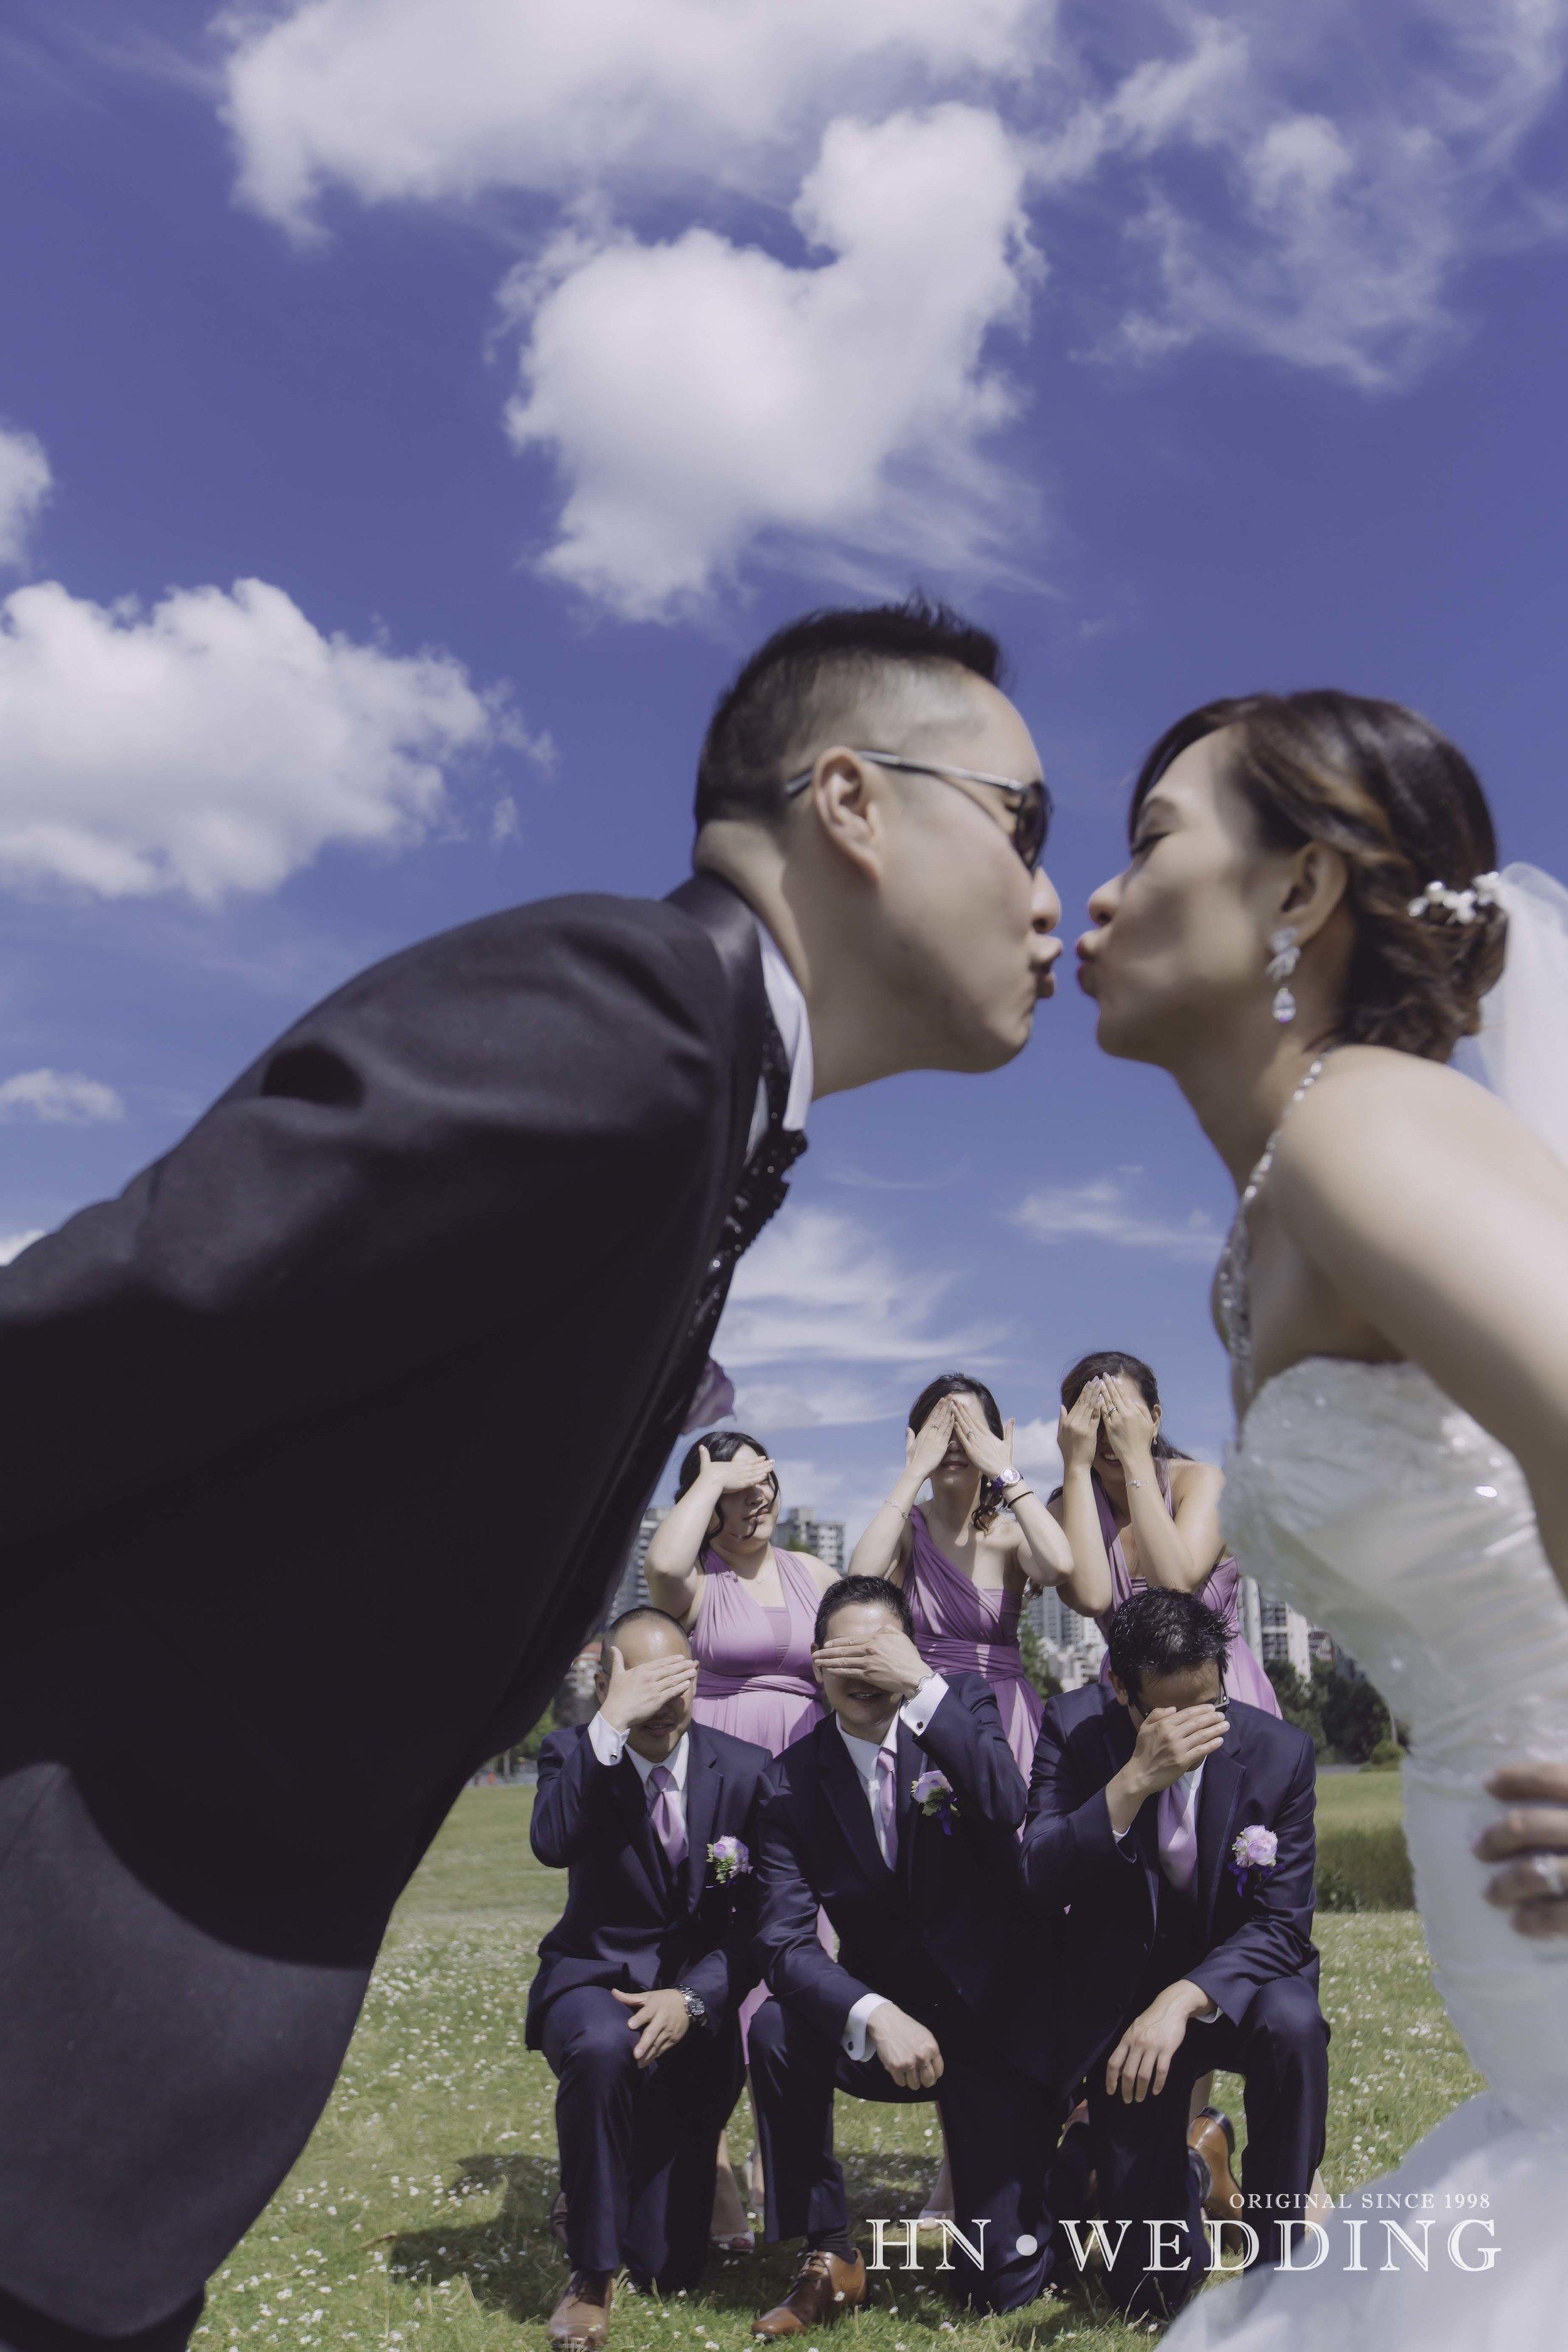 HNwedding-20160822-wedding-6501.jpg